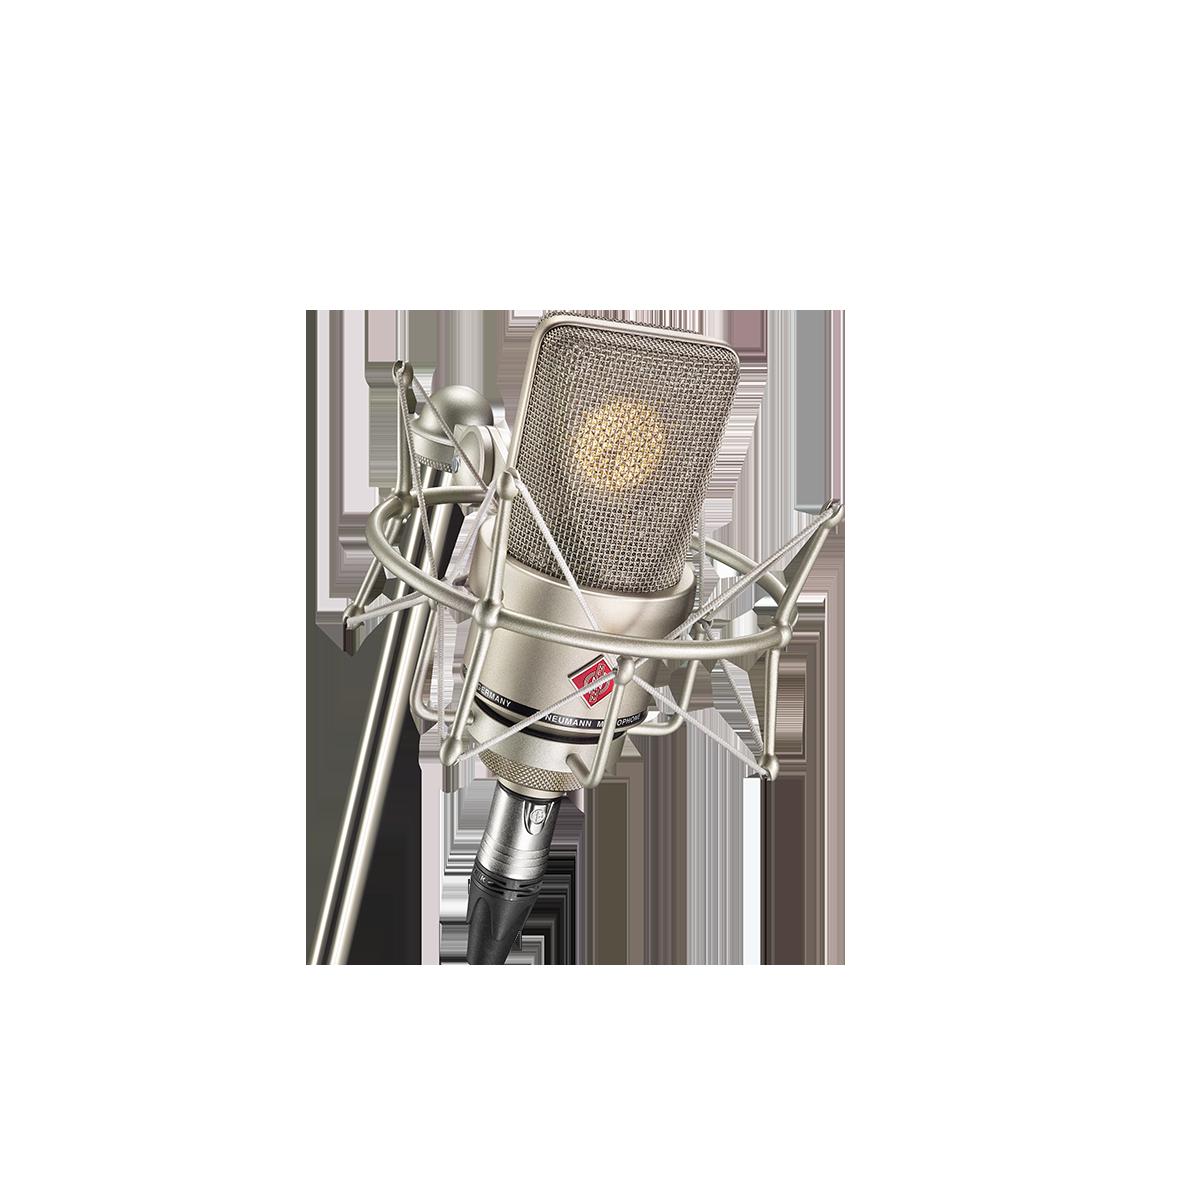 Micros studio - Neumann - TLM 103 Studio Set